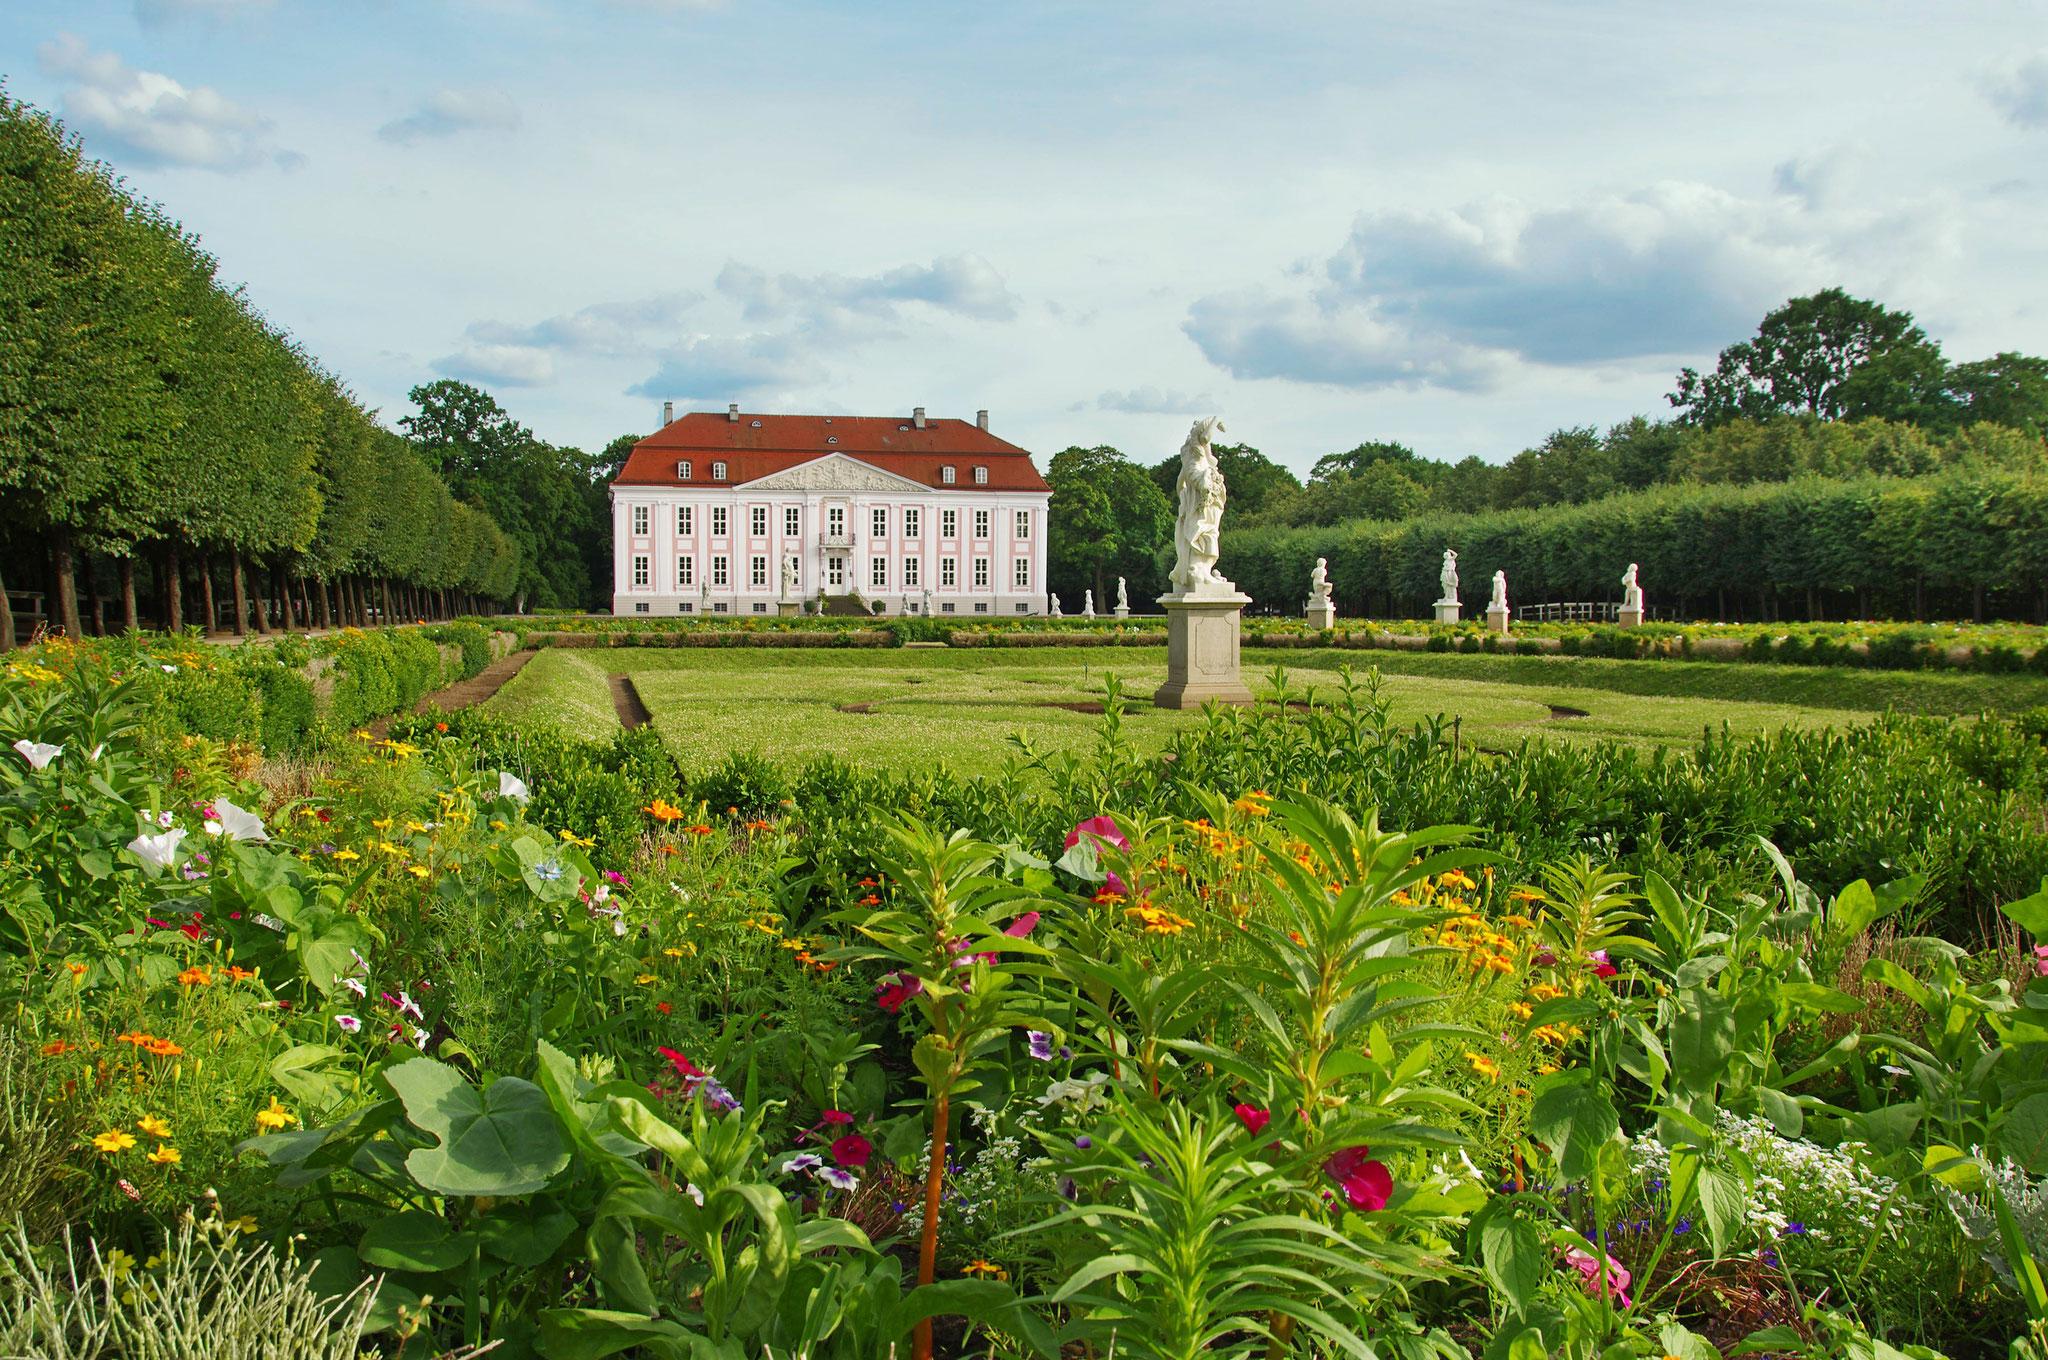 Schloss Friedrichsfelde, Aufnahme: Richard Stelzer